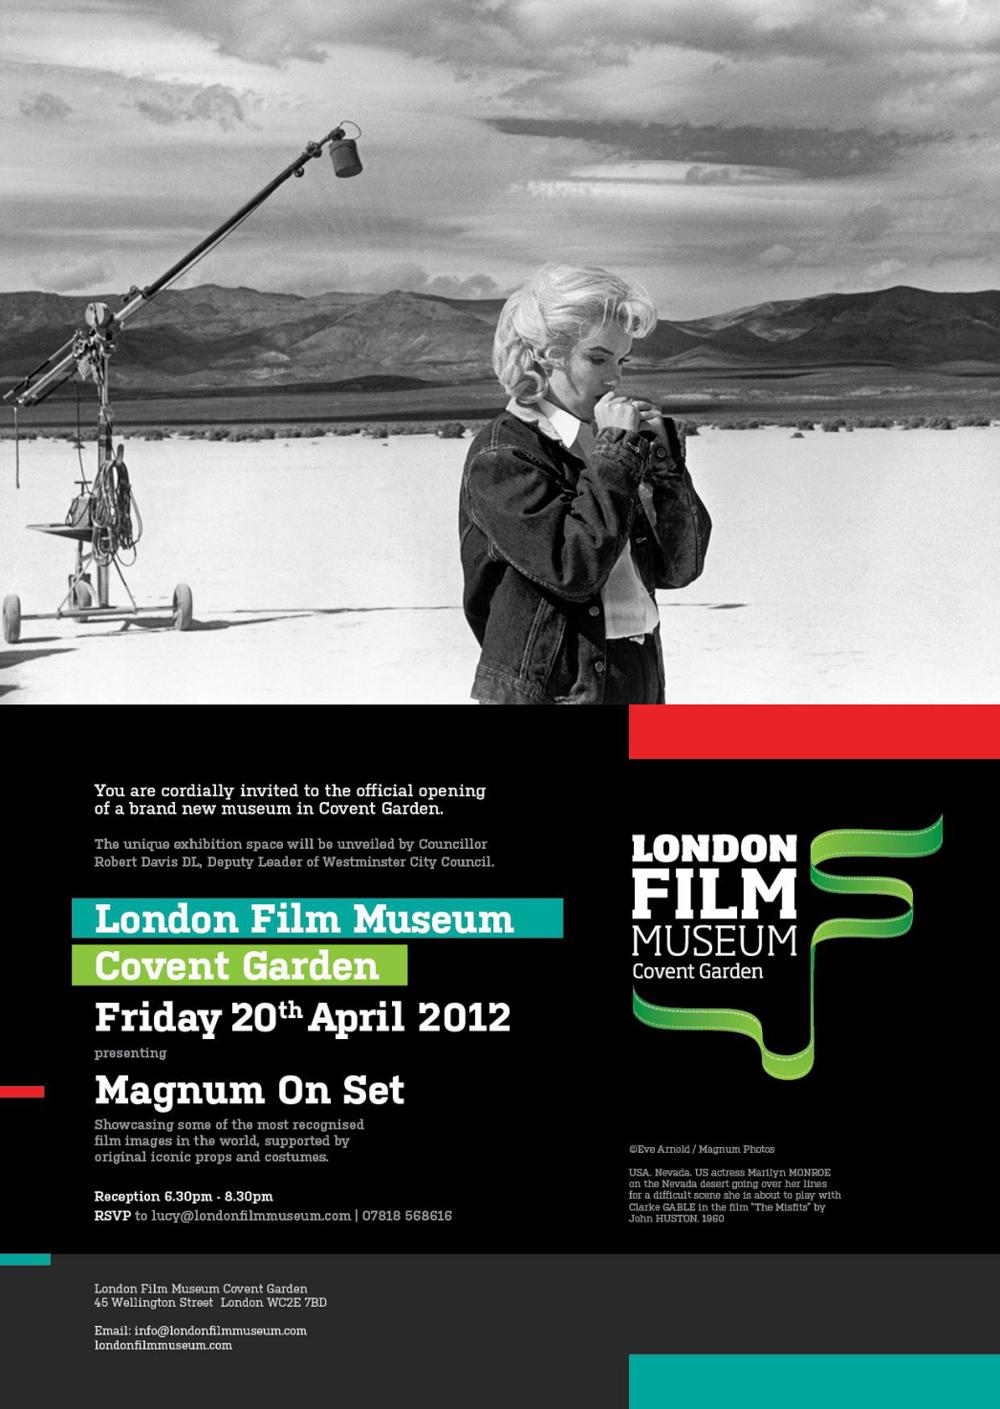 London film museum (Magnum on set)